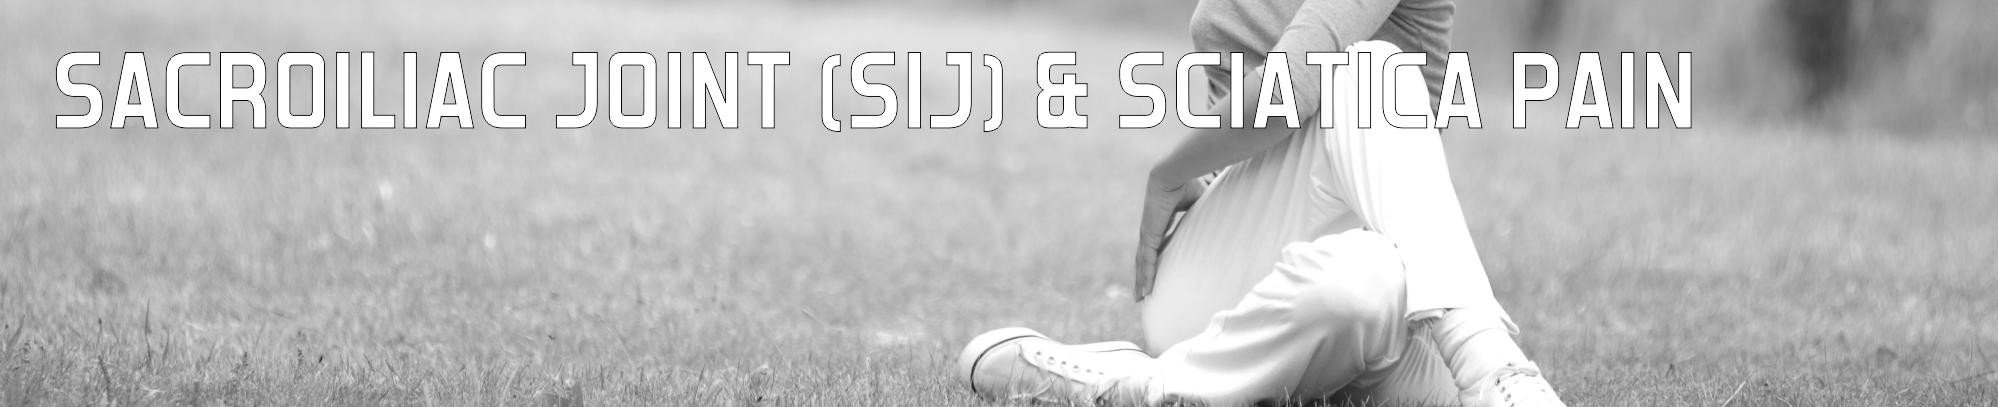 Sacroiliac Joint (SIJ) & Sciatica